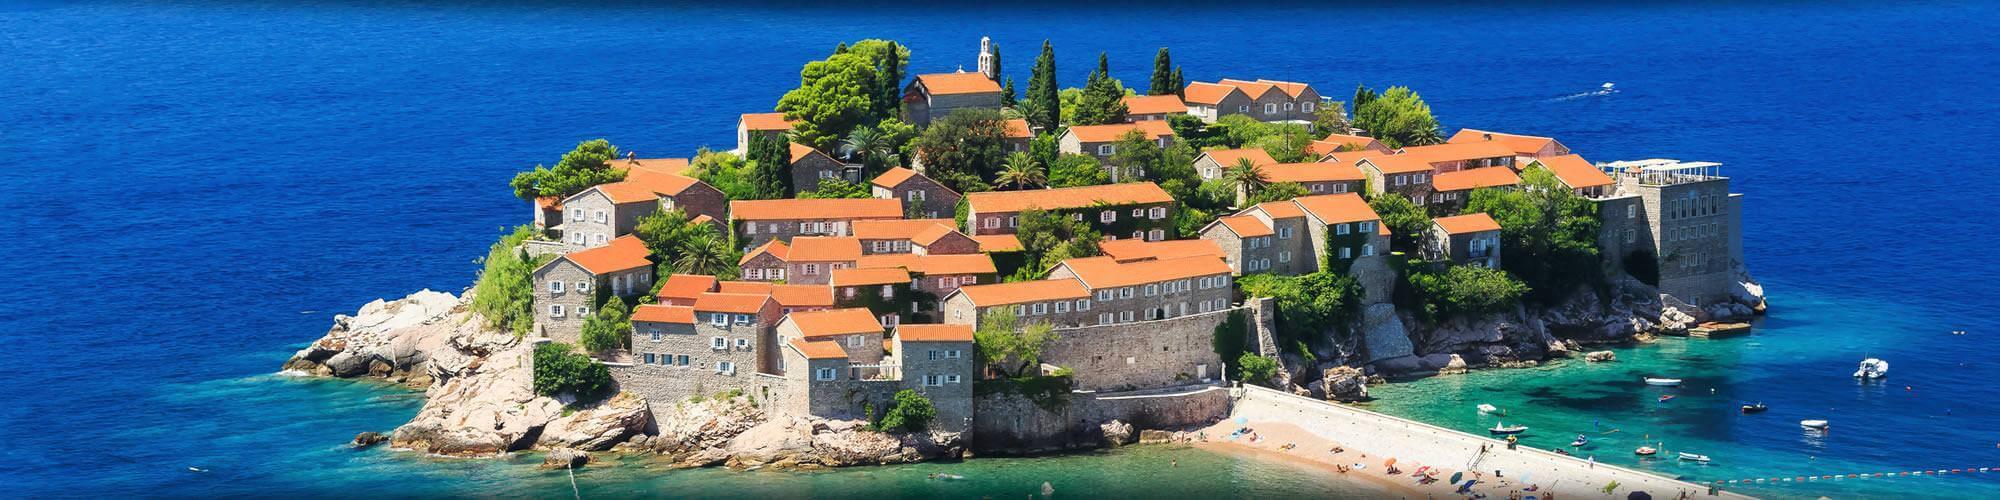 Residence Visa Montenegro, Citizenship